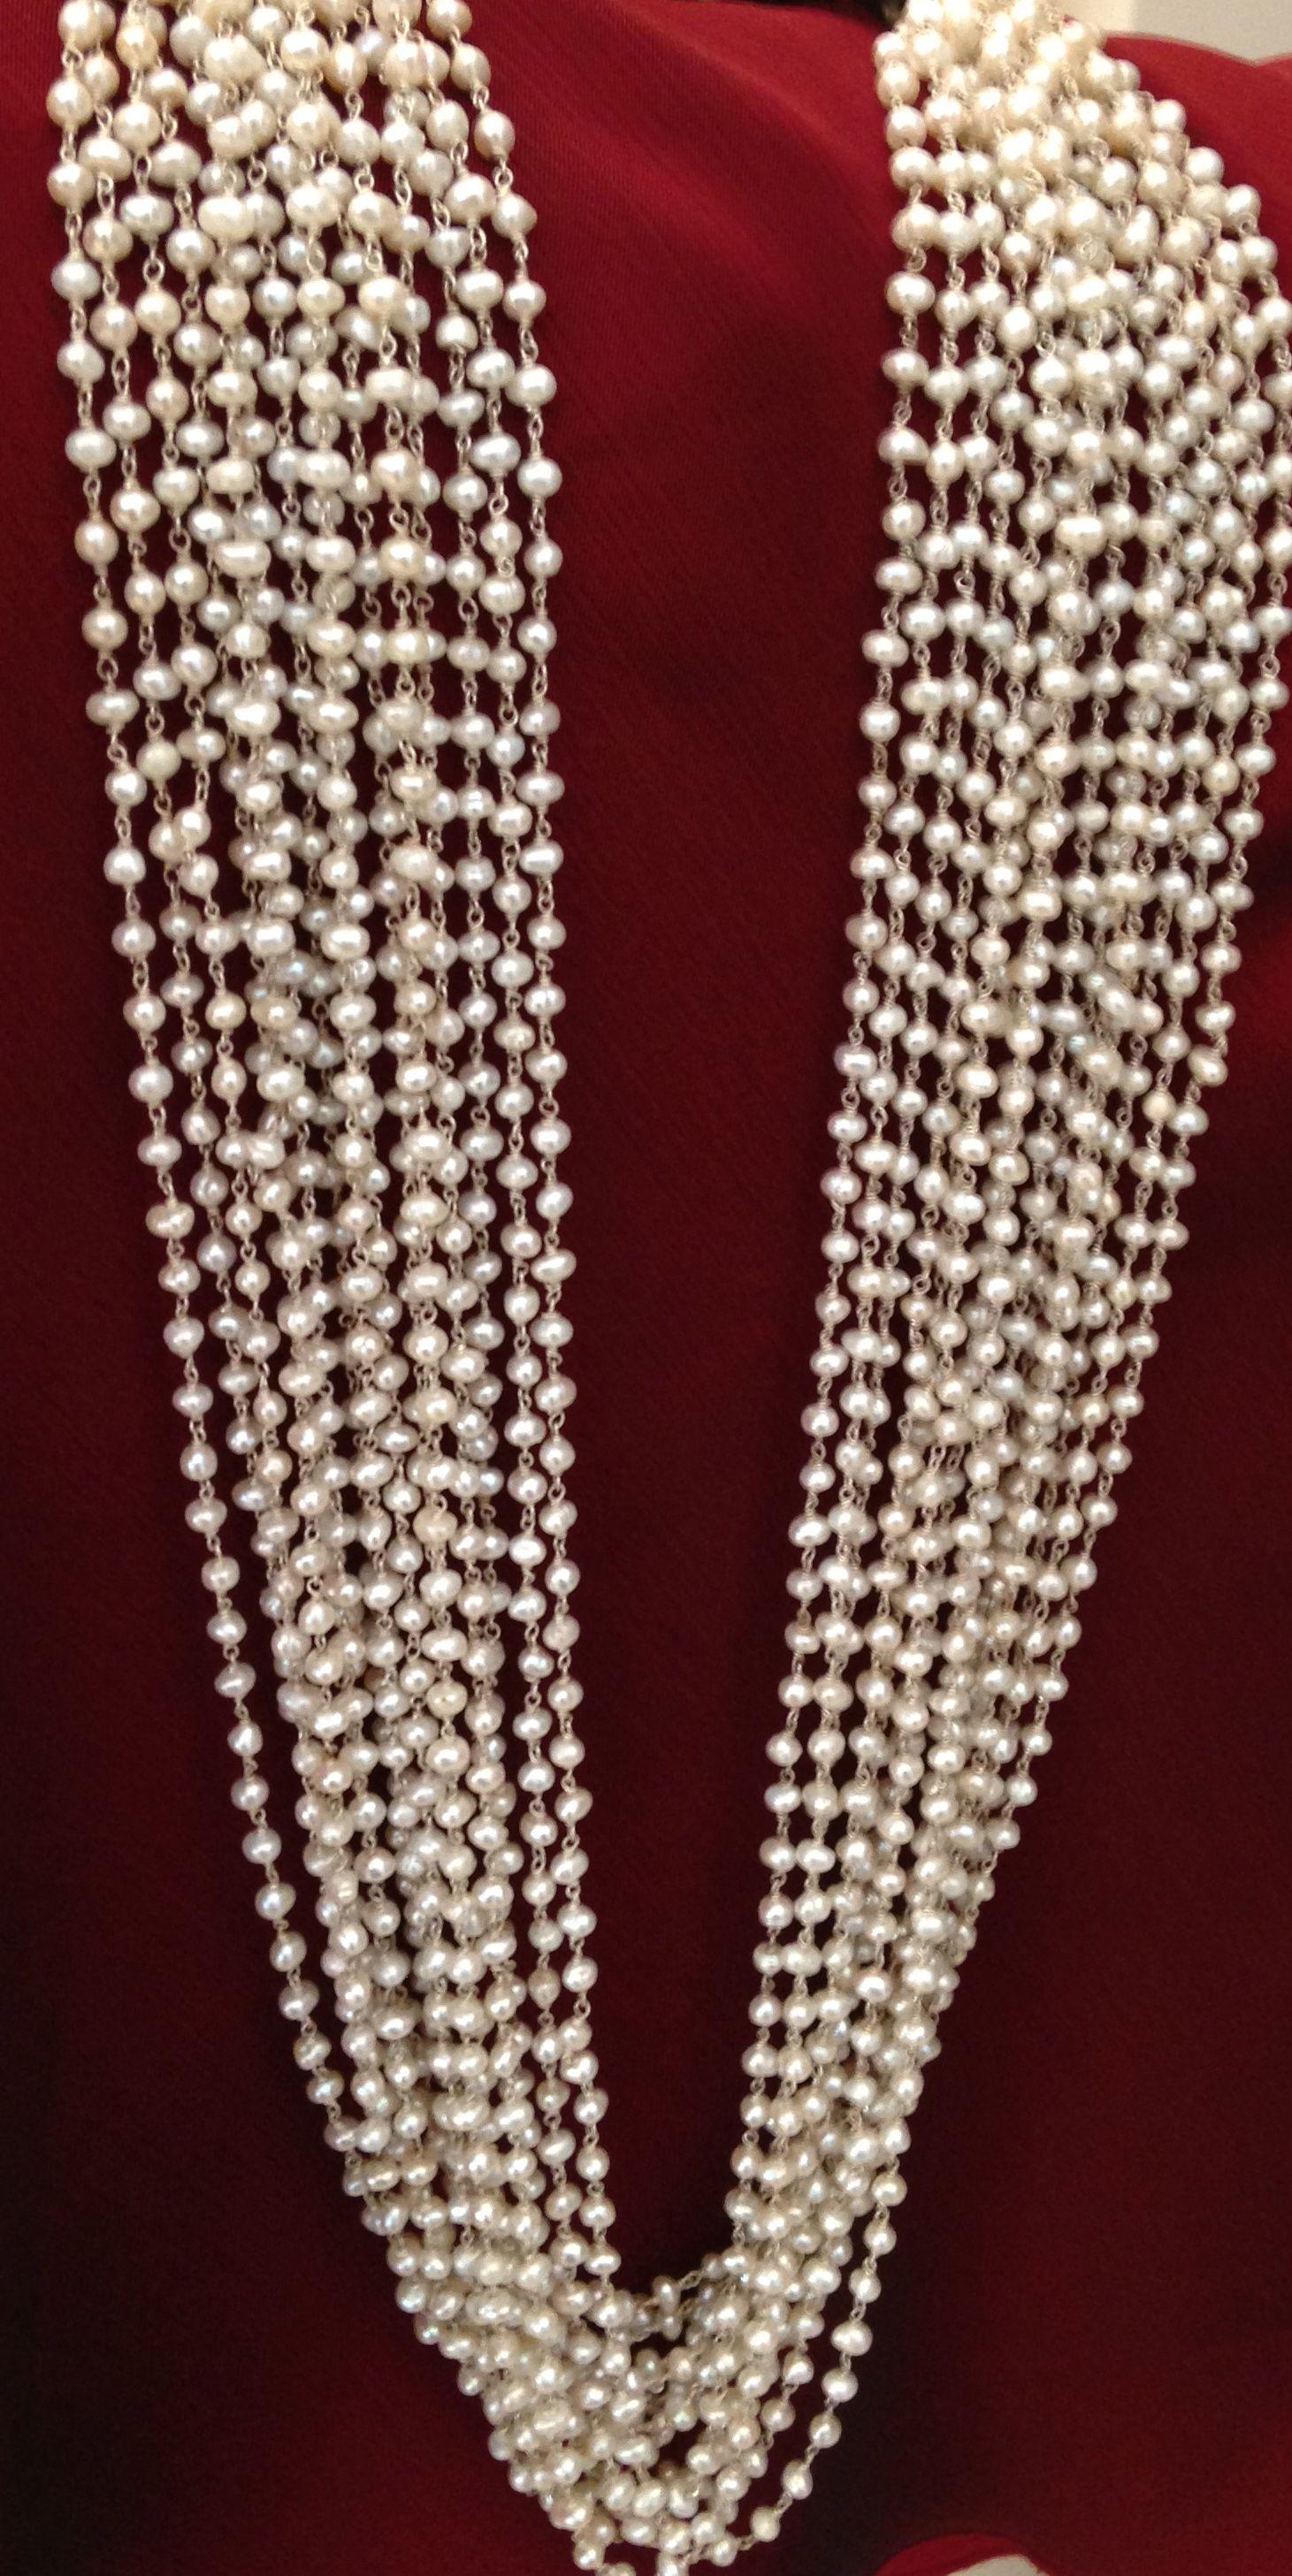 Pearls from Kuber jewellers,Jaipur